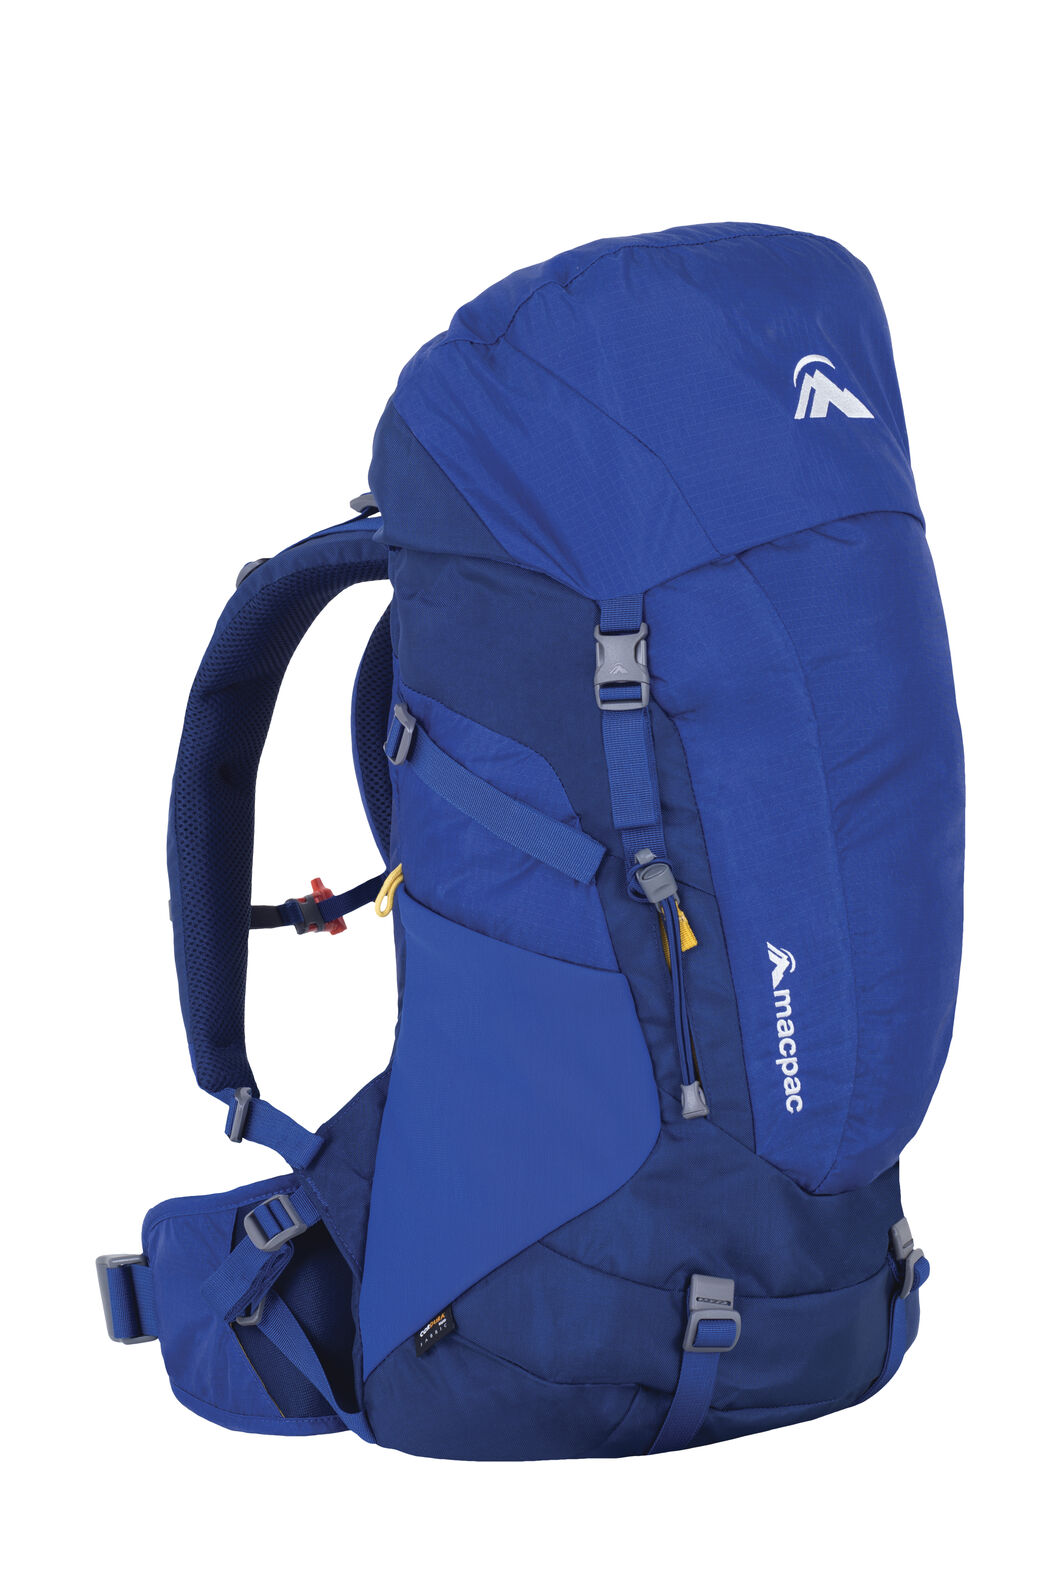 Macpac Torlesse 35L Pack, Surf The Web, hi-res